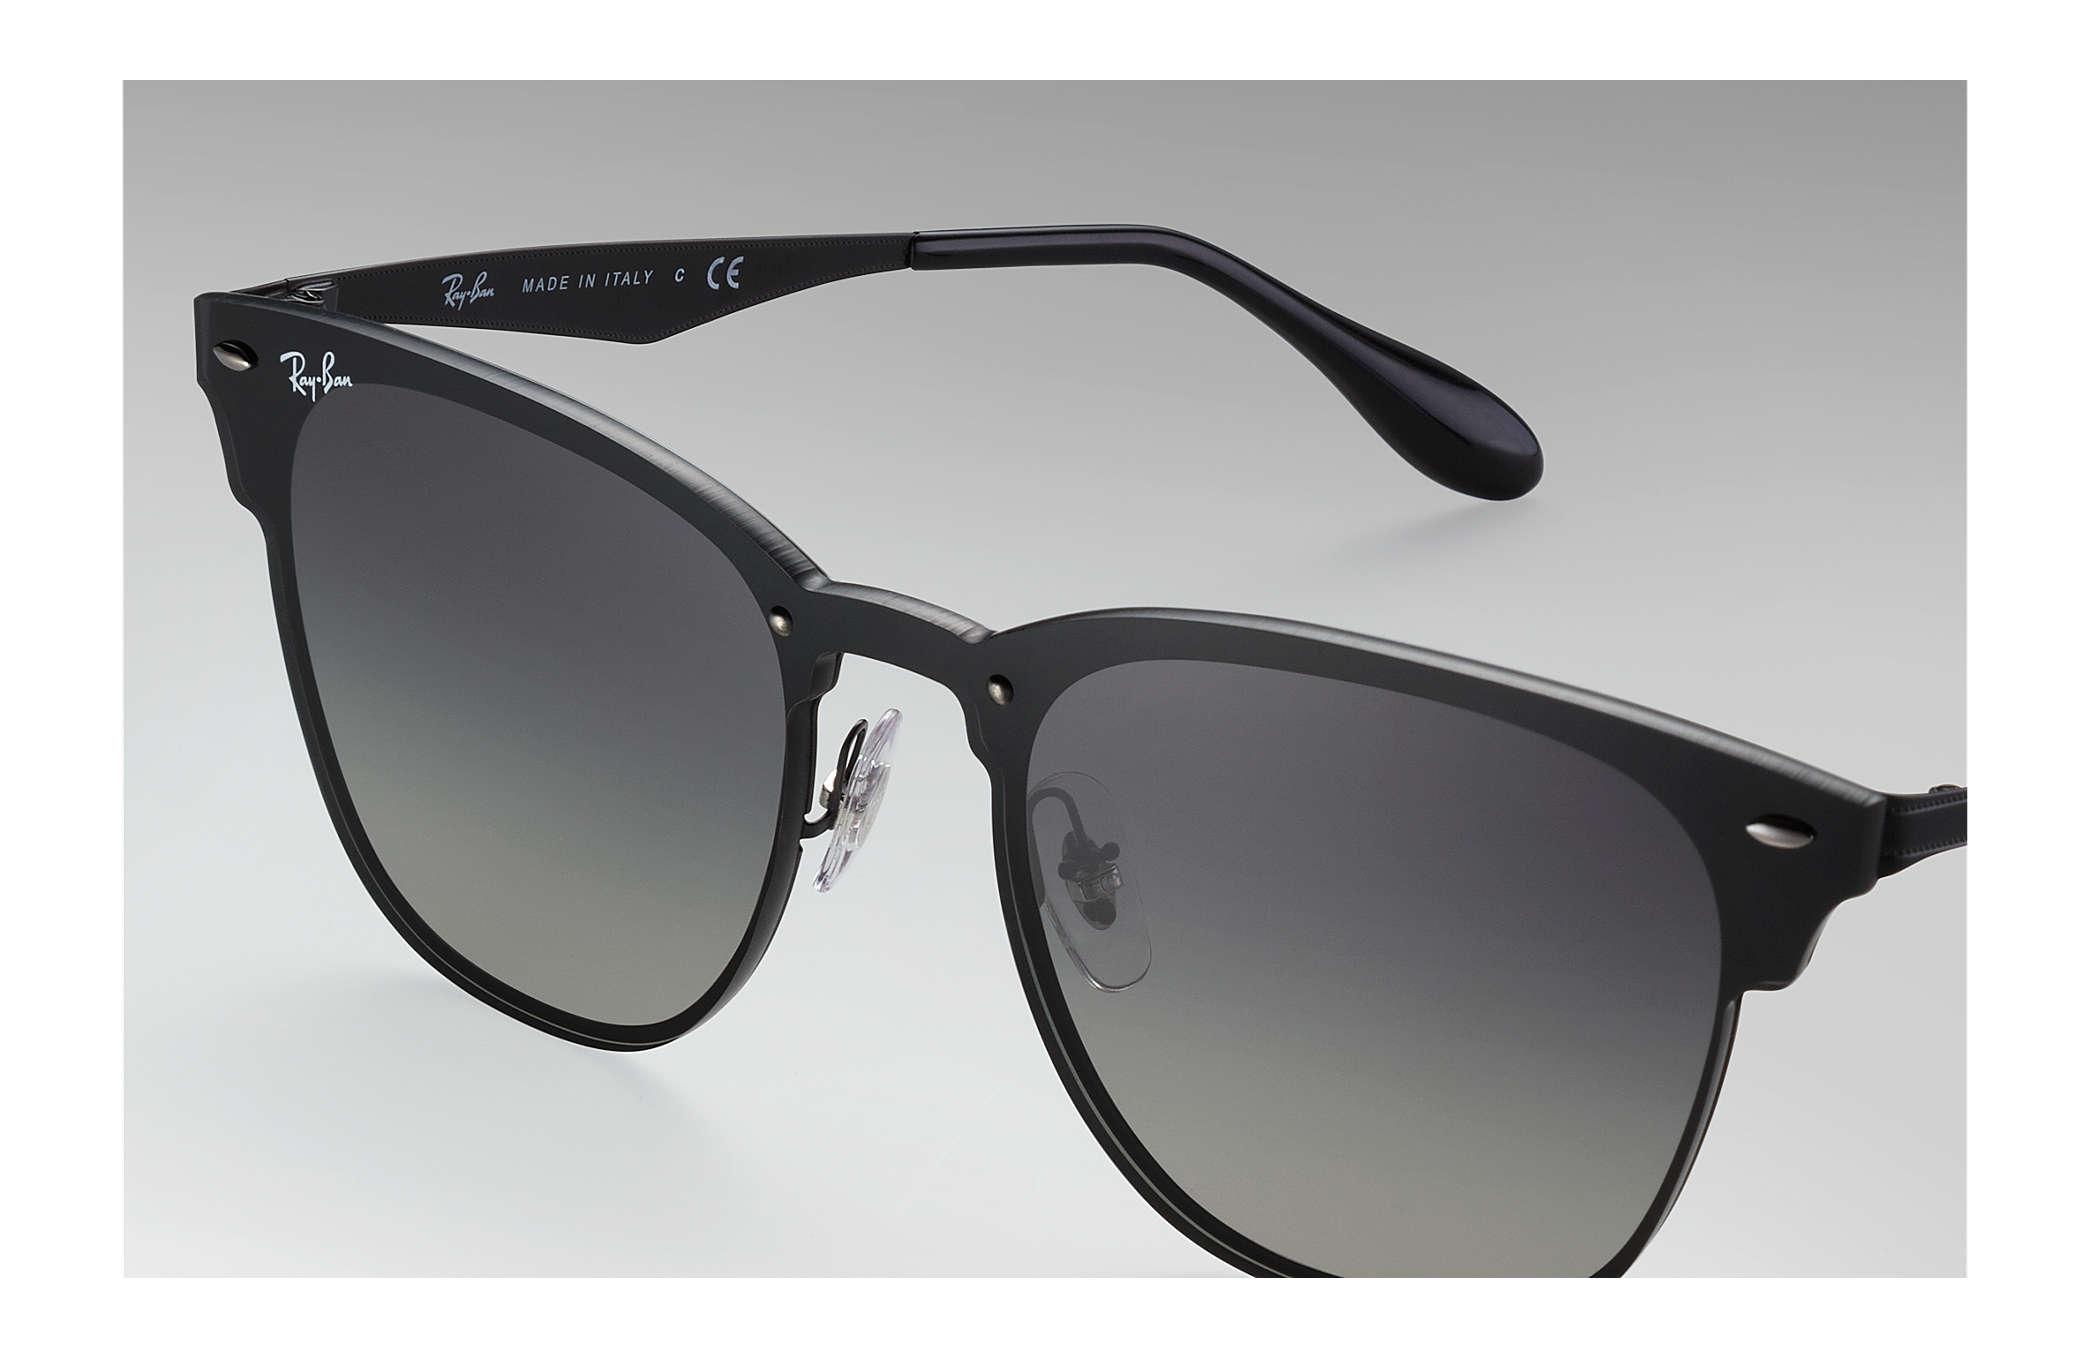 518871a743 Ray-Ban Blaze Clubmaster RB3576N Black - Steel - Grey Lenses ...